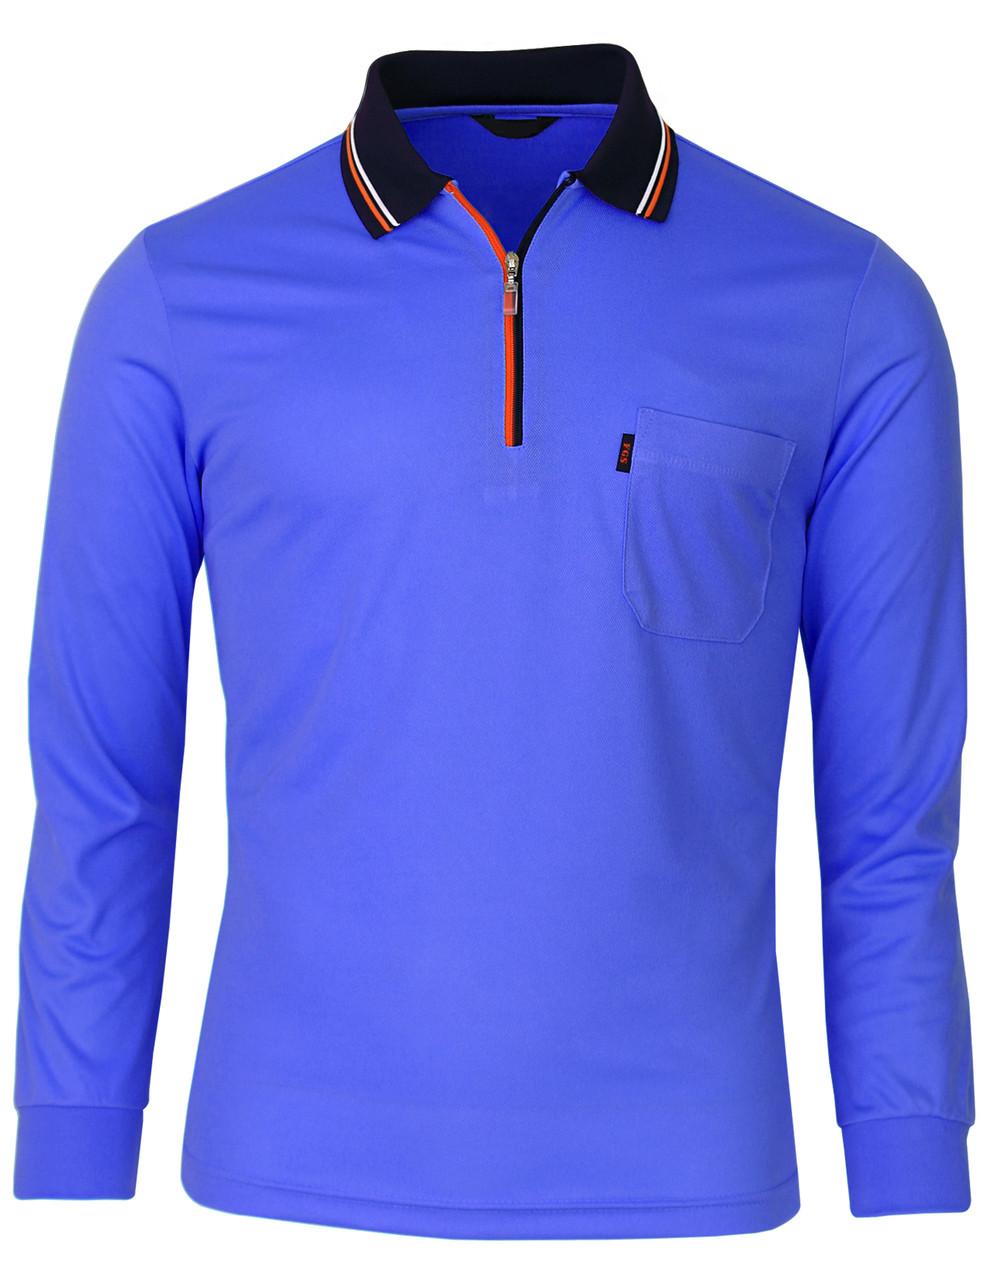 BCPOLO Mens Stretch Polo Shirt Short Sleeve Dri Fit Spandex Polo Shirt